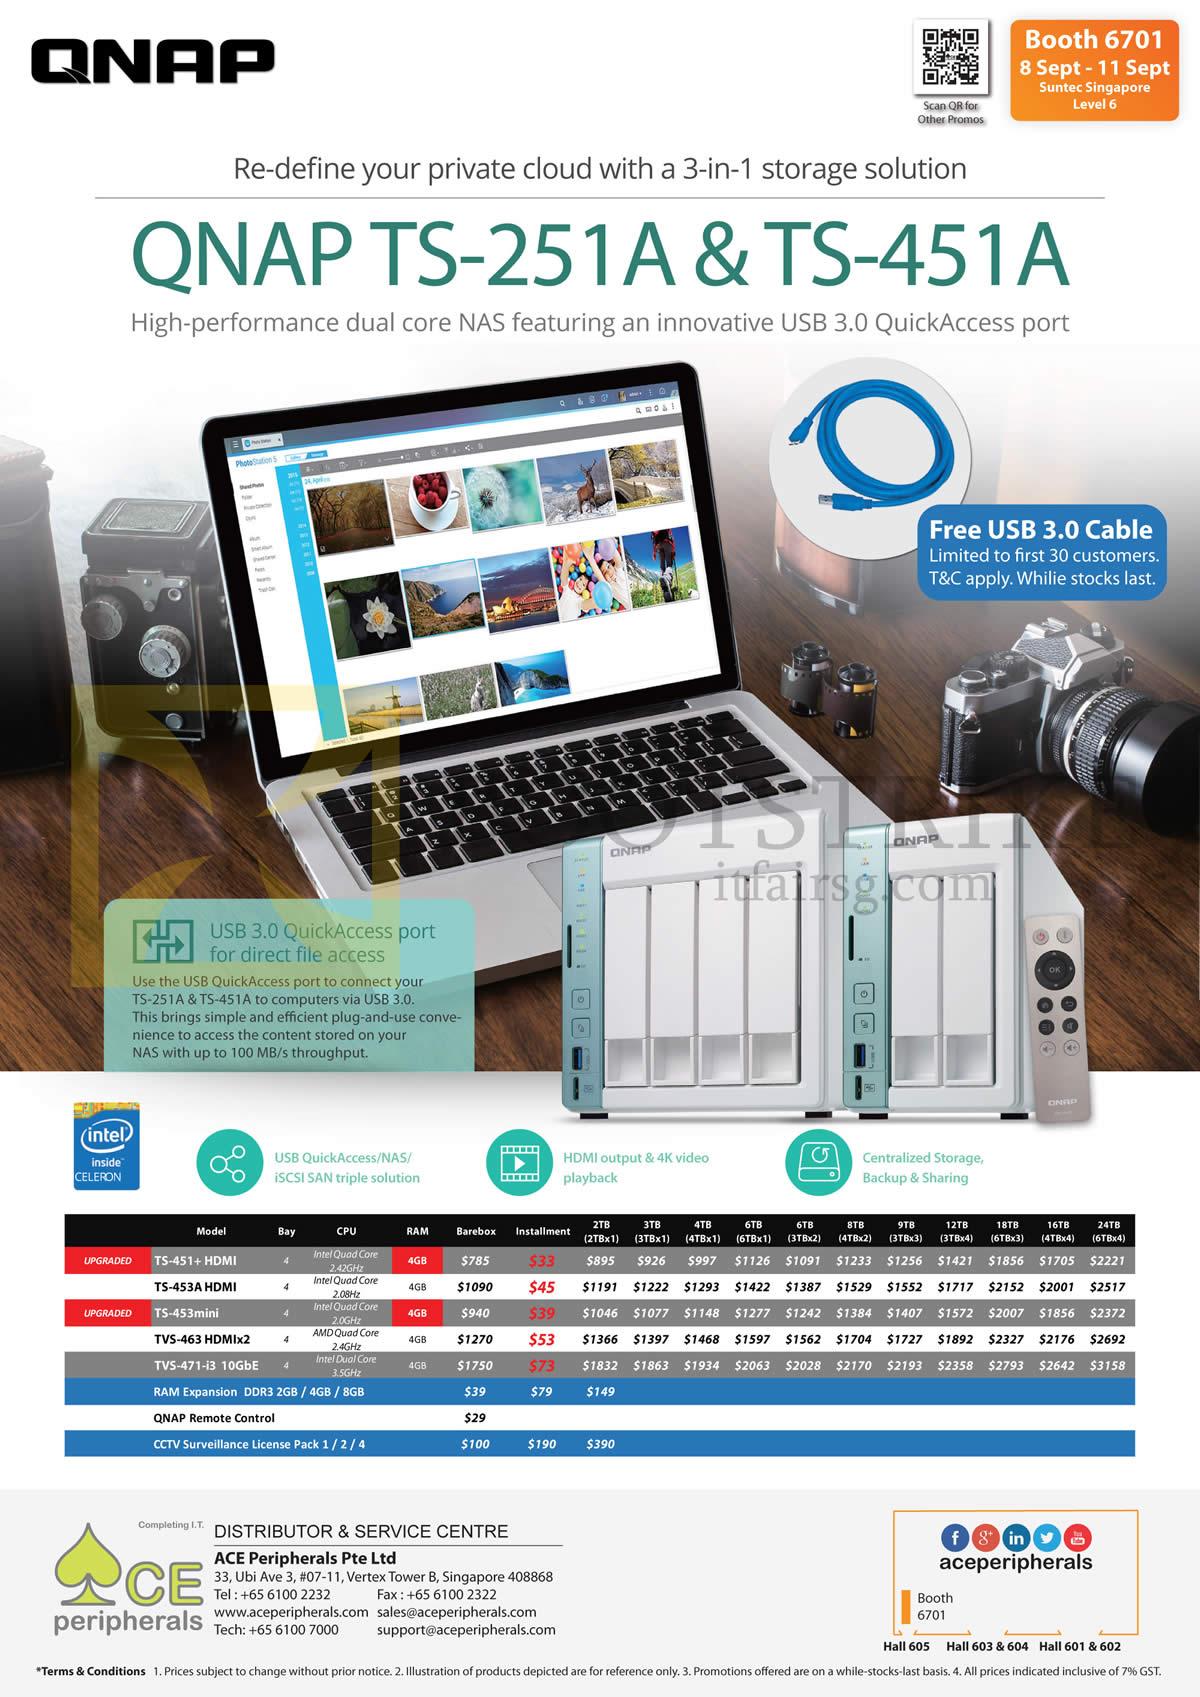 COMEX 2016 price list image brochure of Ace Peripherals QNAP Private Cloud TS-451 Plus, 453A, 453mini, TVS-463 HDMIx2, 471-i3, RAM Expression DDR3 2GB, 4GB, 8GB, QNAP NAS Remote Control, CCTV Surveillance